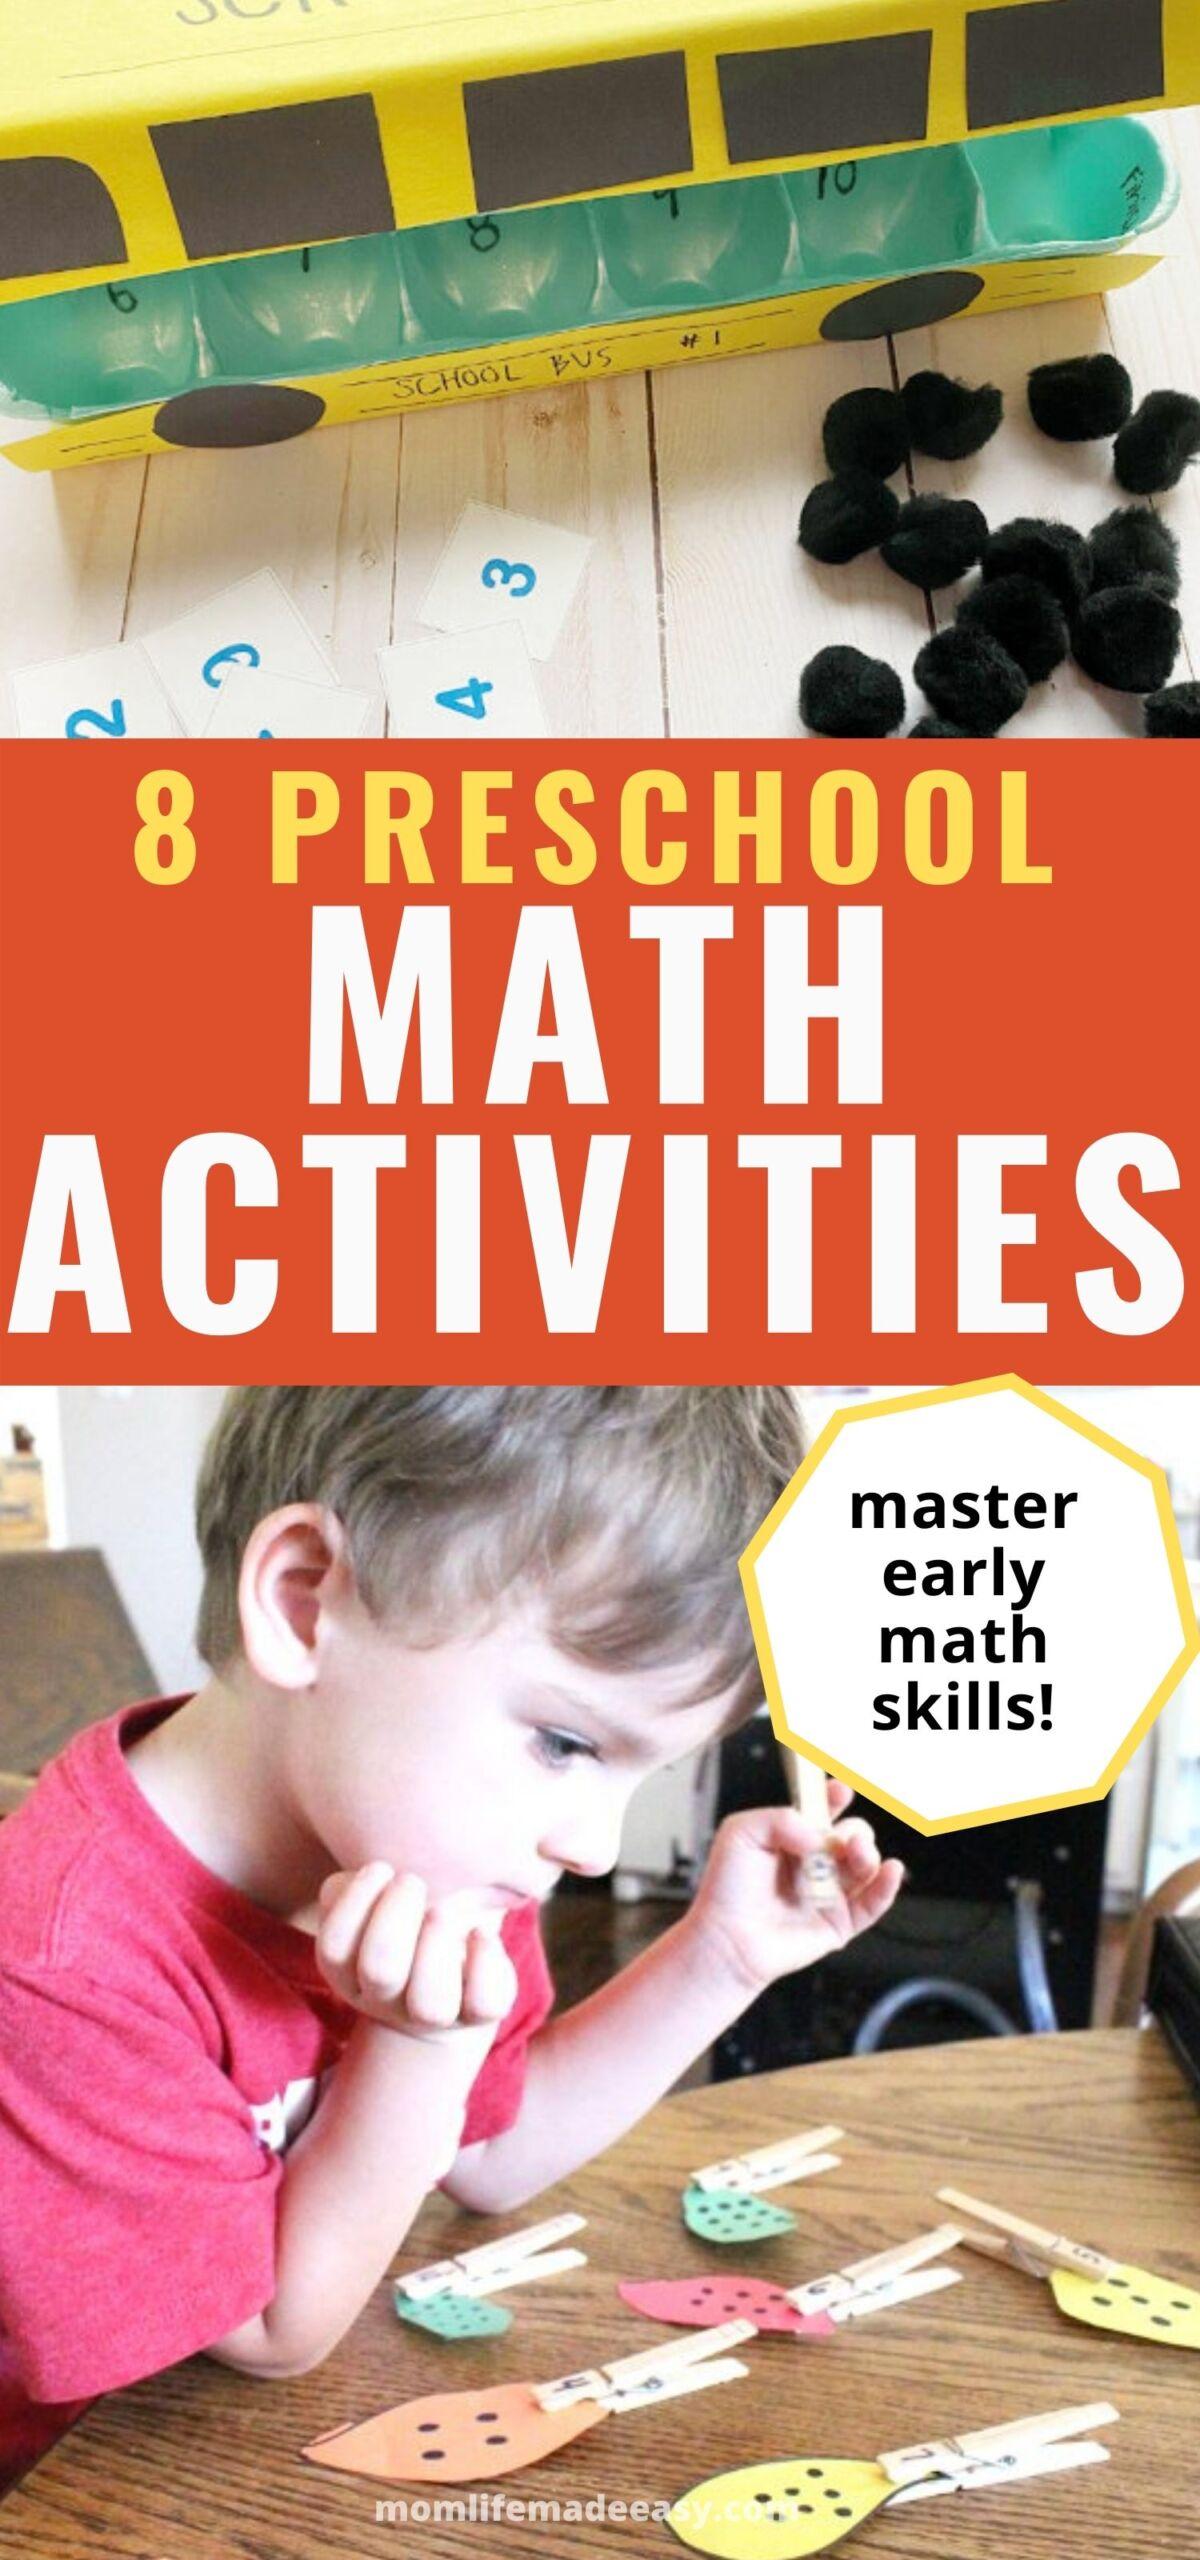 preschool math activities Pinterest promotional collage